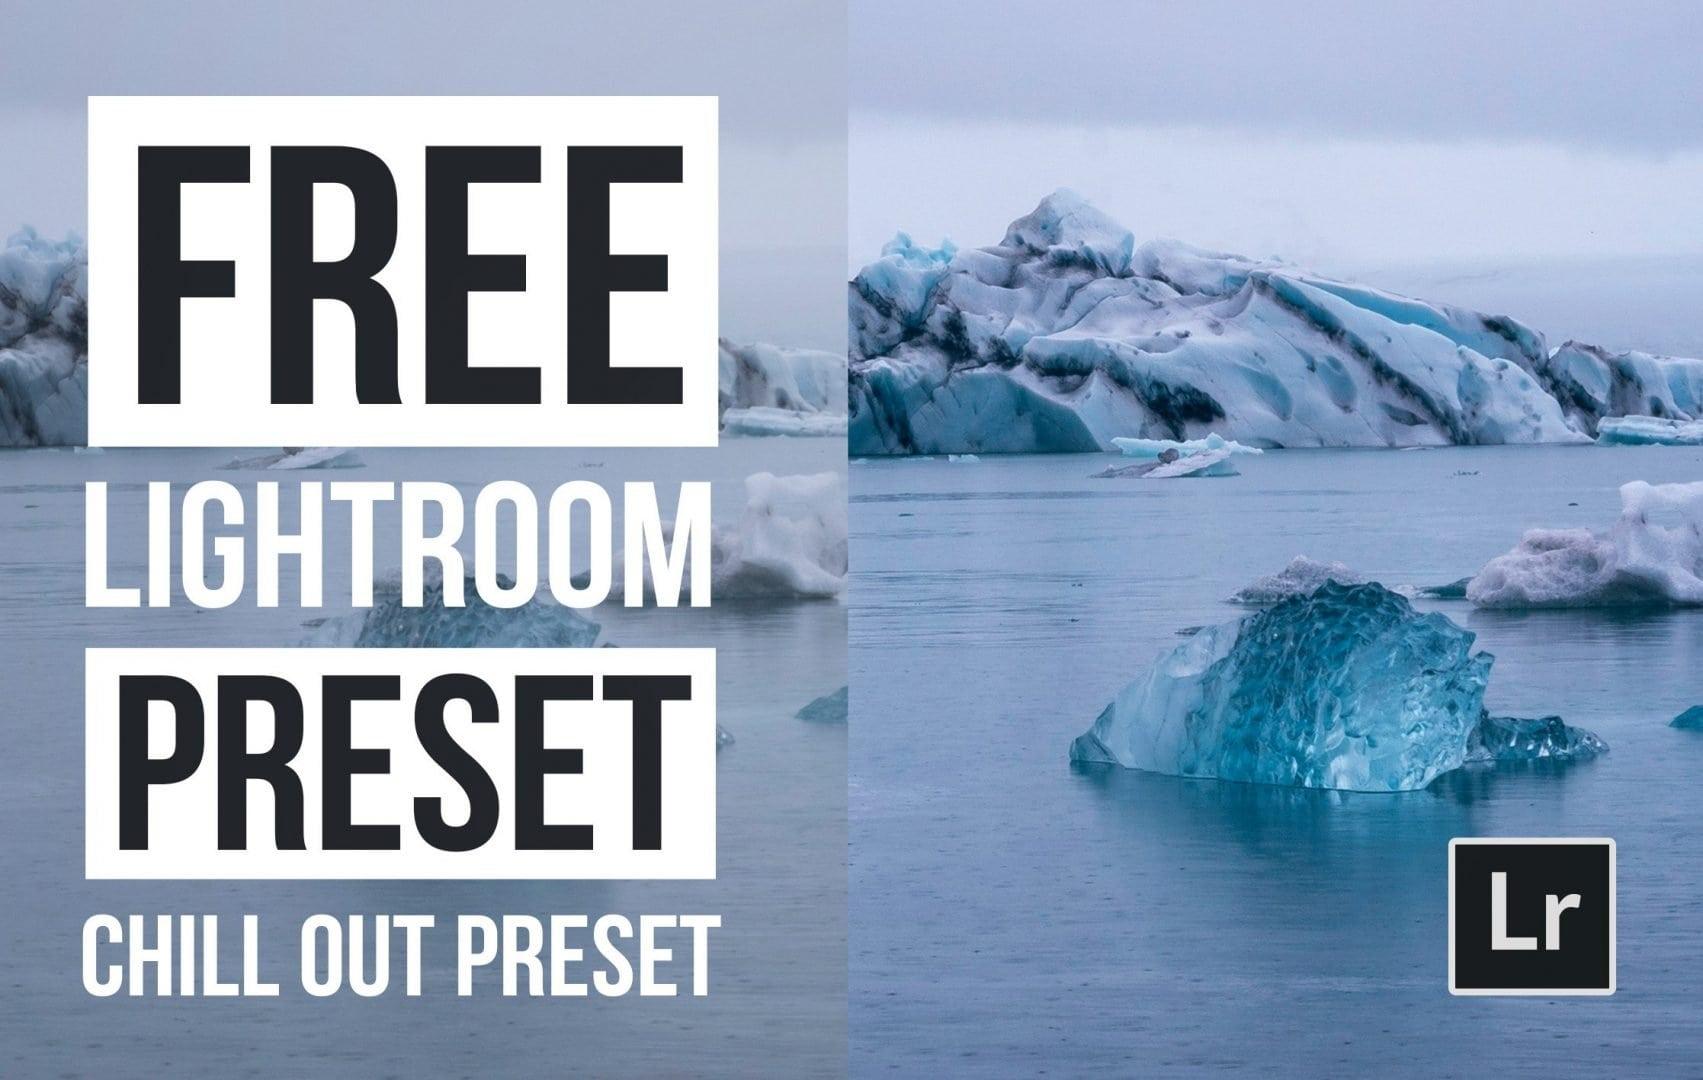 Free-Lightroom-Preset-Chill-Out-Cover Presetpro.com